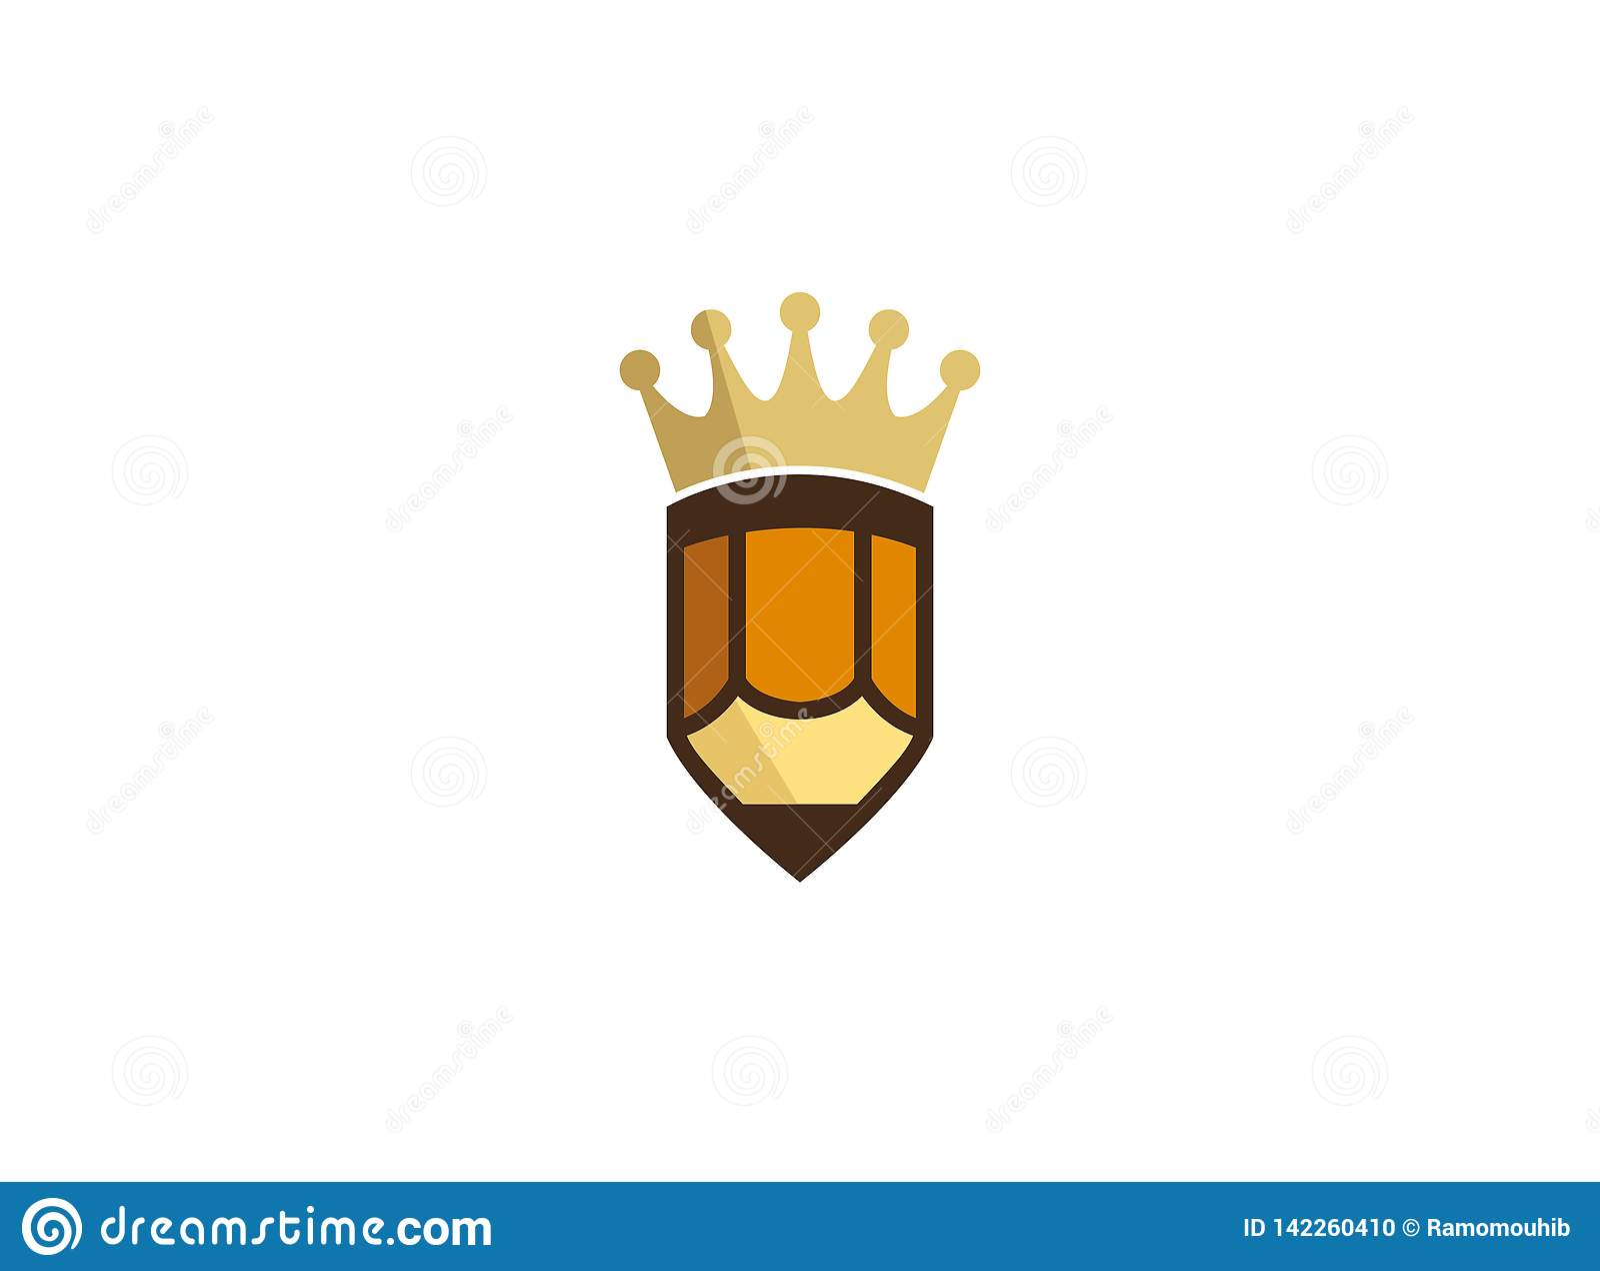 Guld- krona på en liten pennlogo